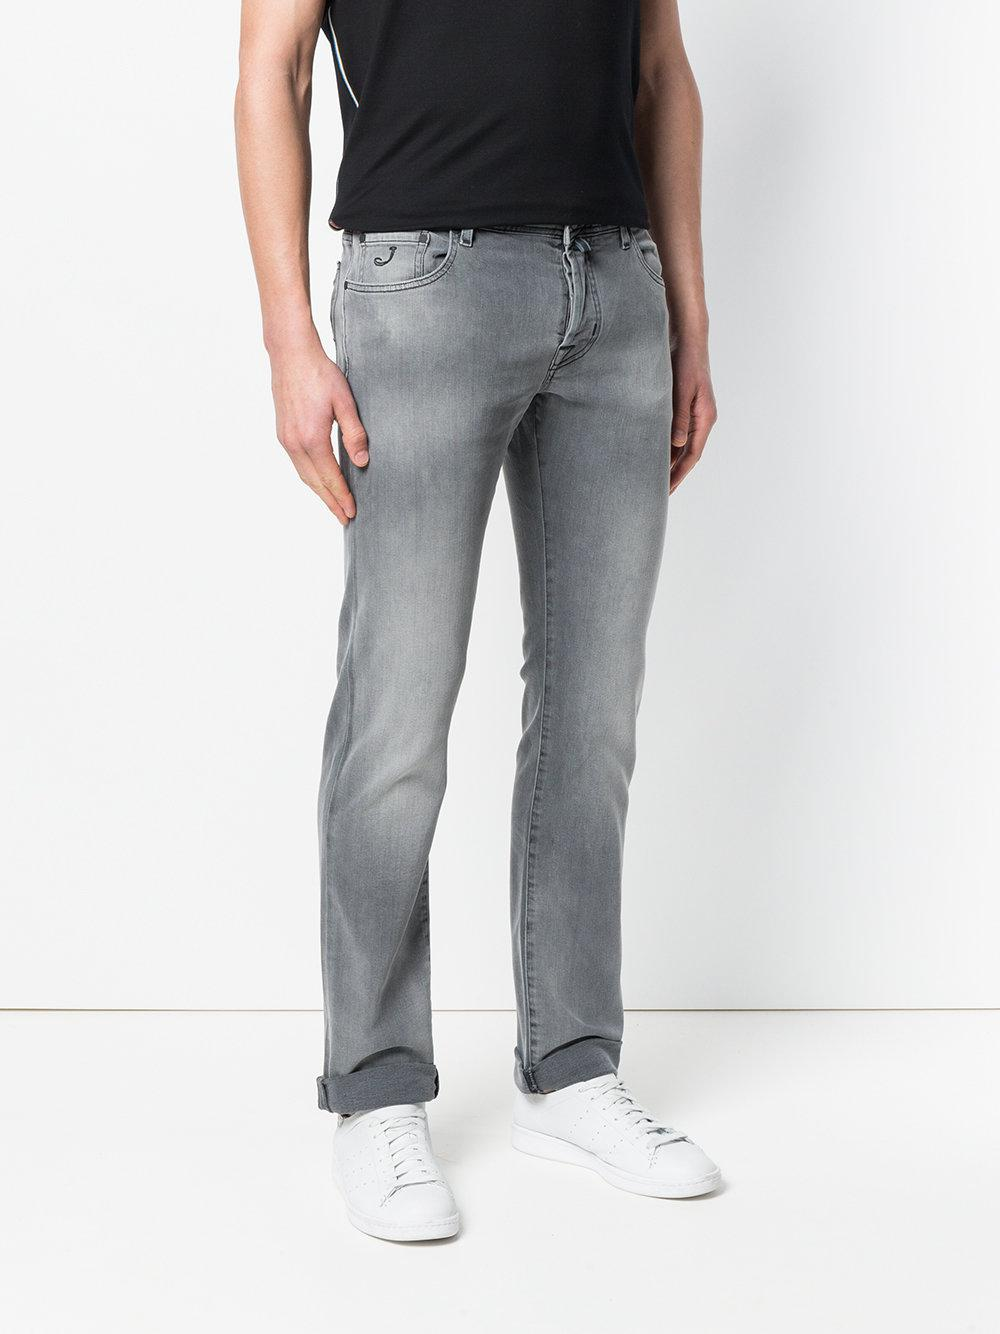 Jacob Cohen Denim Stonewashed Skinny Jeans in Grey (Grey) for Men